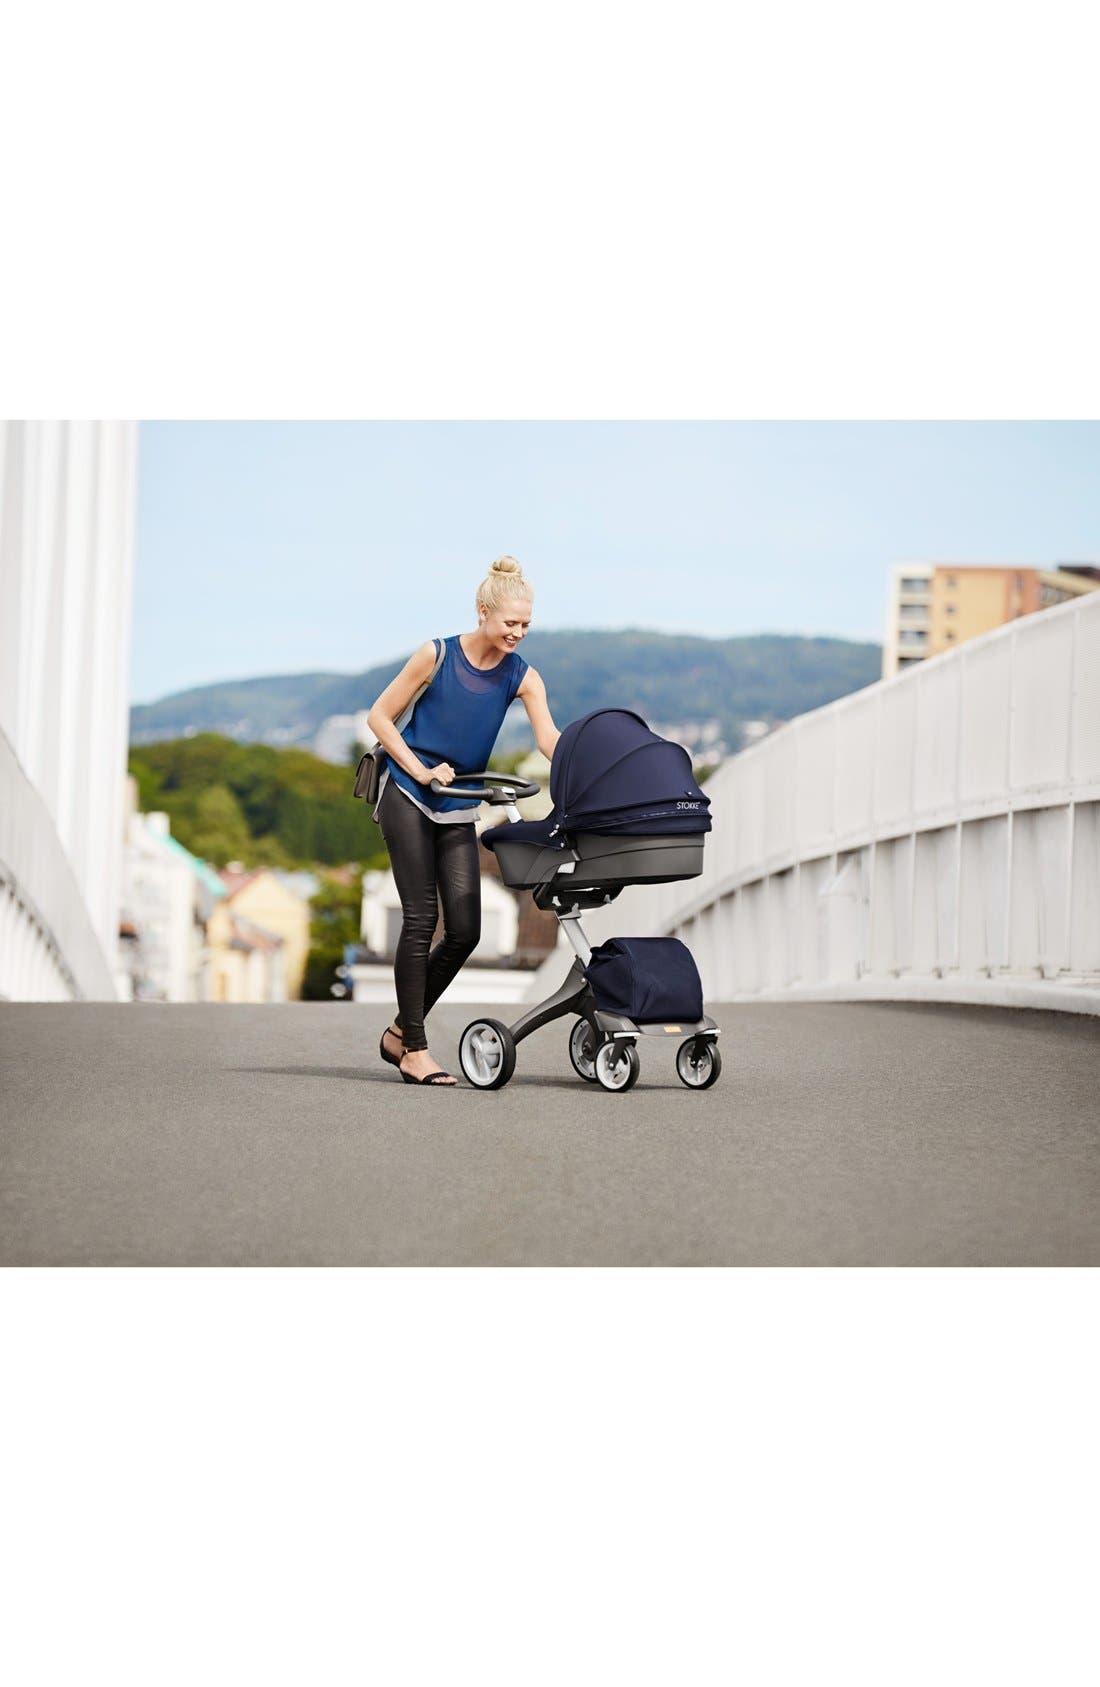 'Xplory<sup>®</sup>' Stroller Carry Cot,                             Alternate thumbnail 3, color,                             001